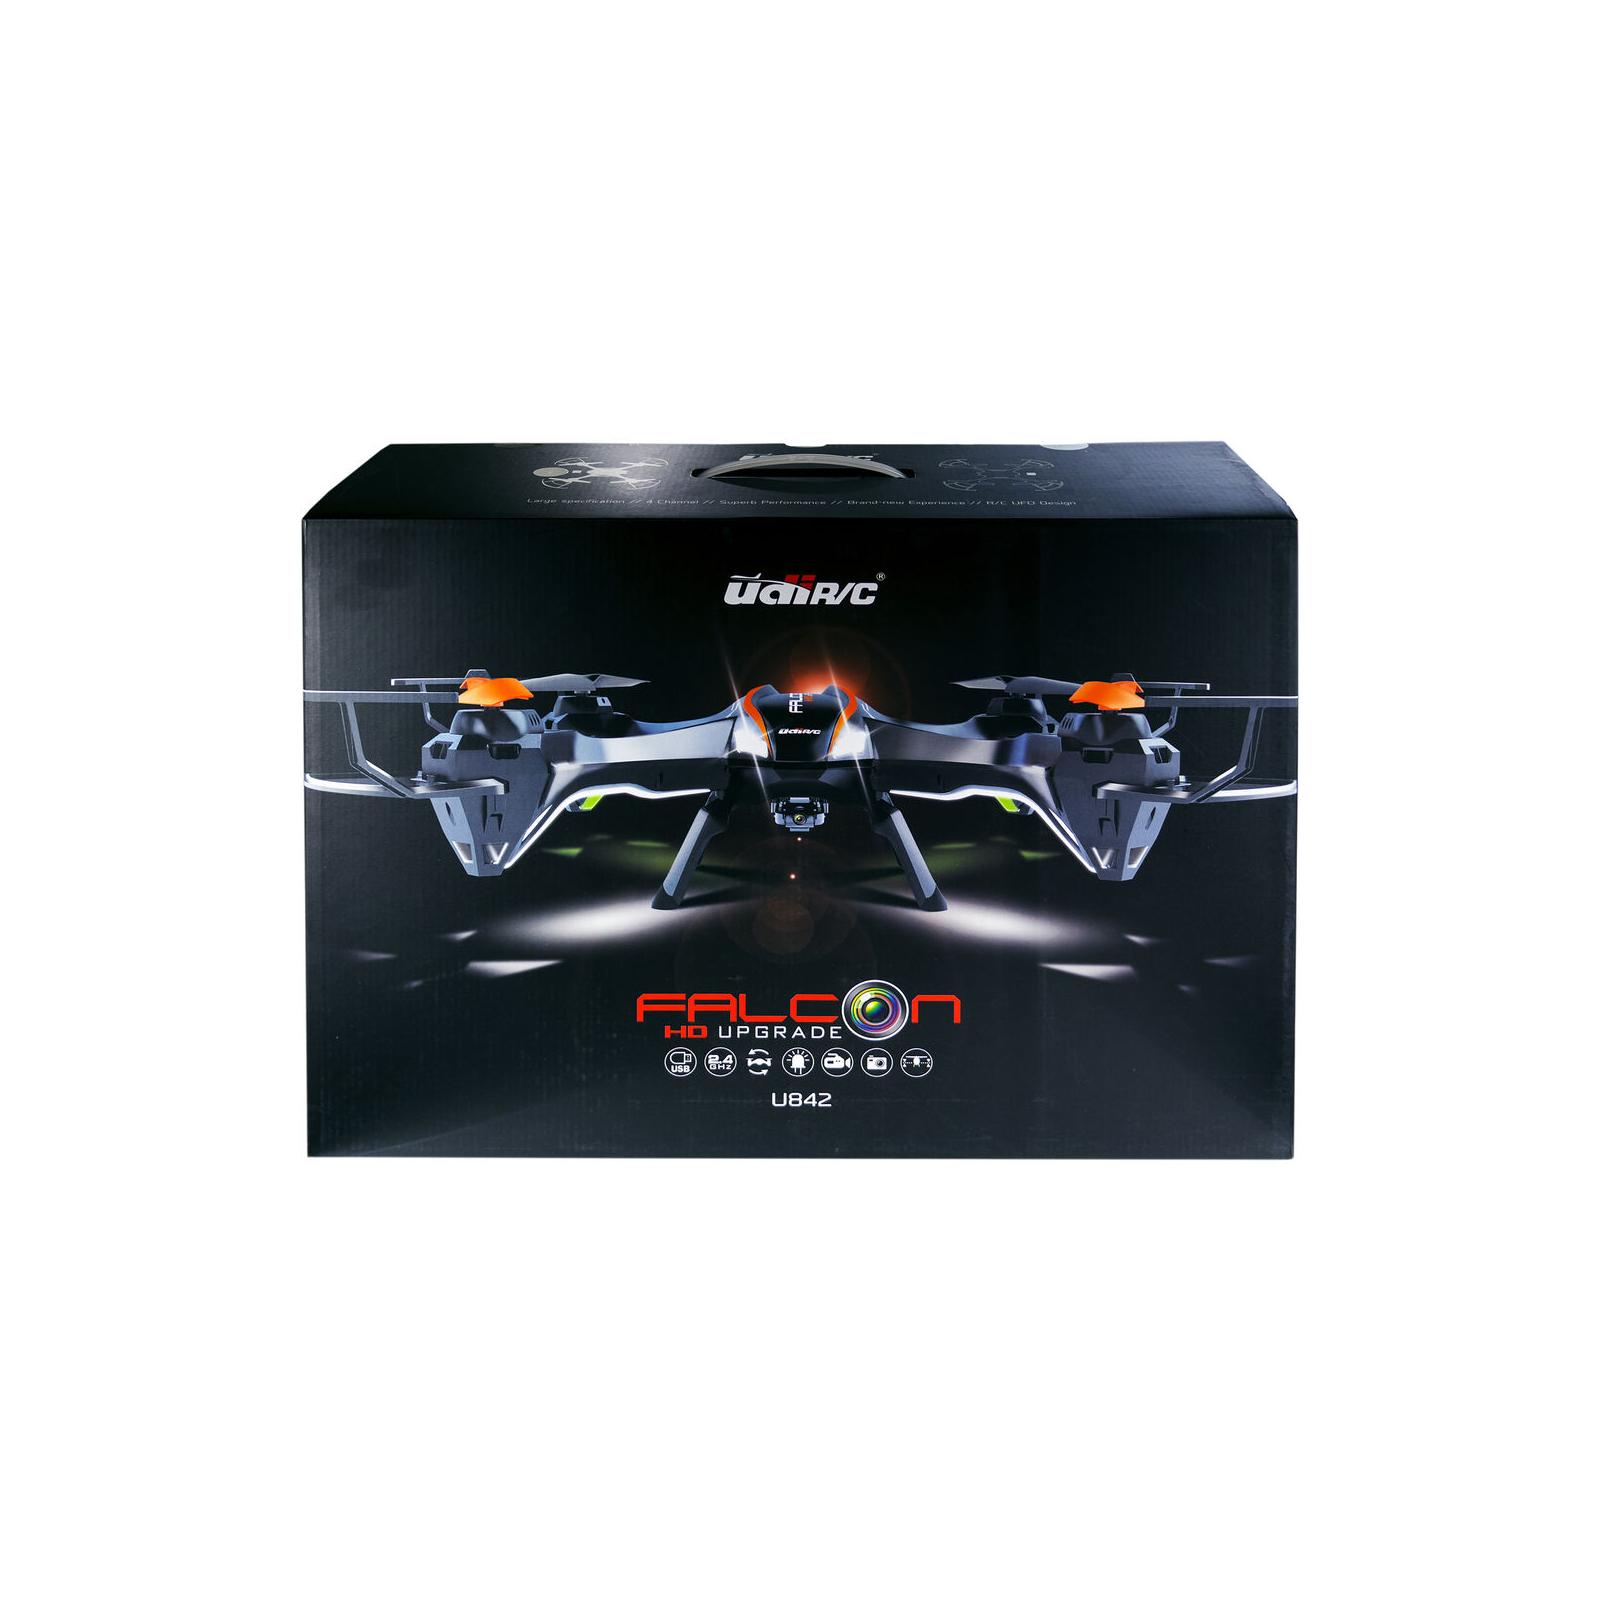 Квадрокоптер UDIRC U842 FALCON 2,4 GHz 486 мм HD бортовая камера 4CH (U842 Black) изображение 6